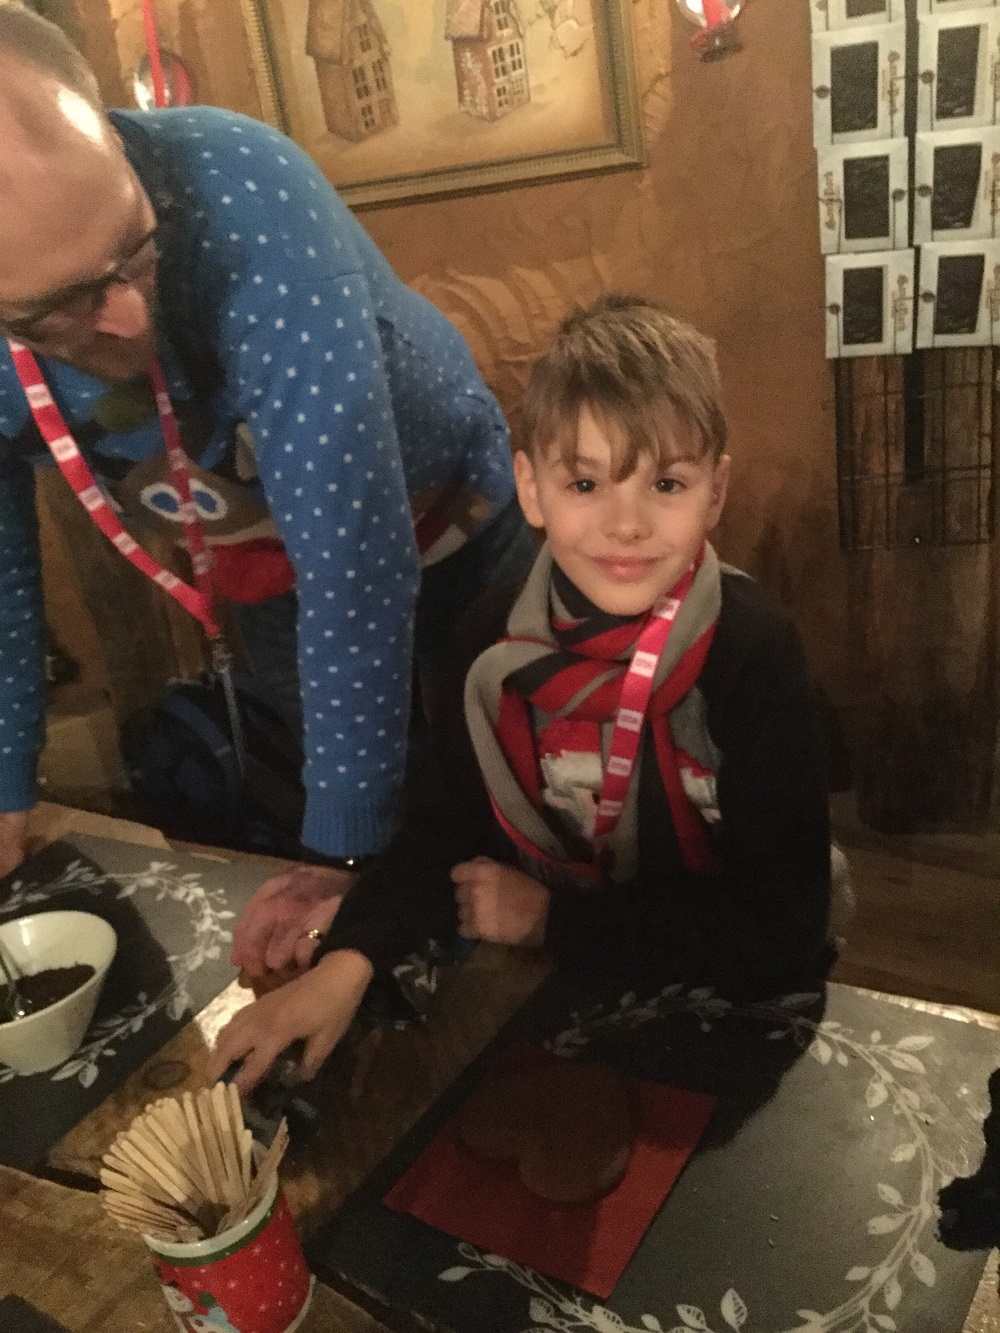 Pupil enjoys making crafts